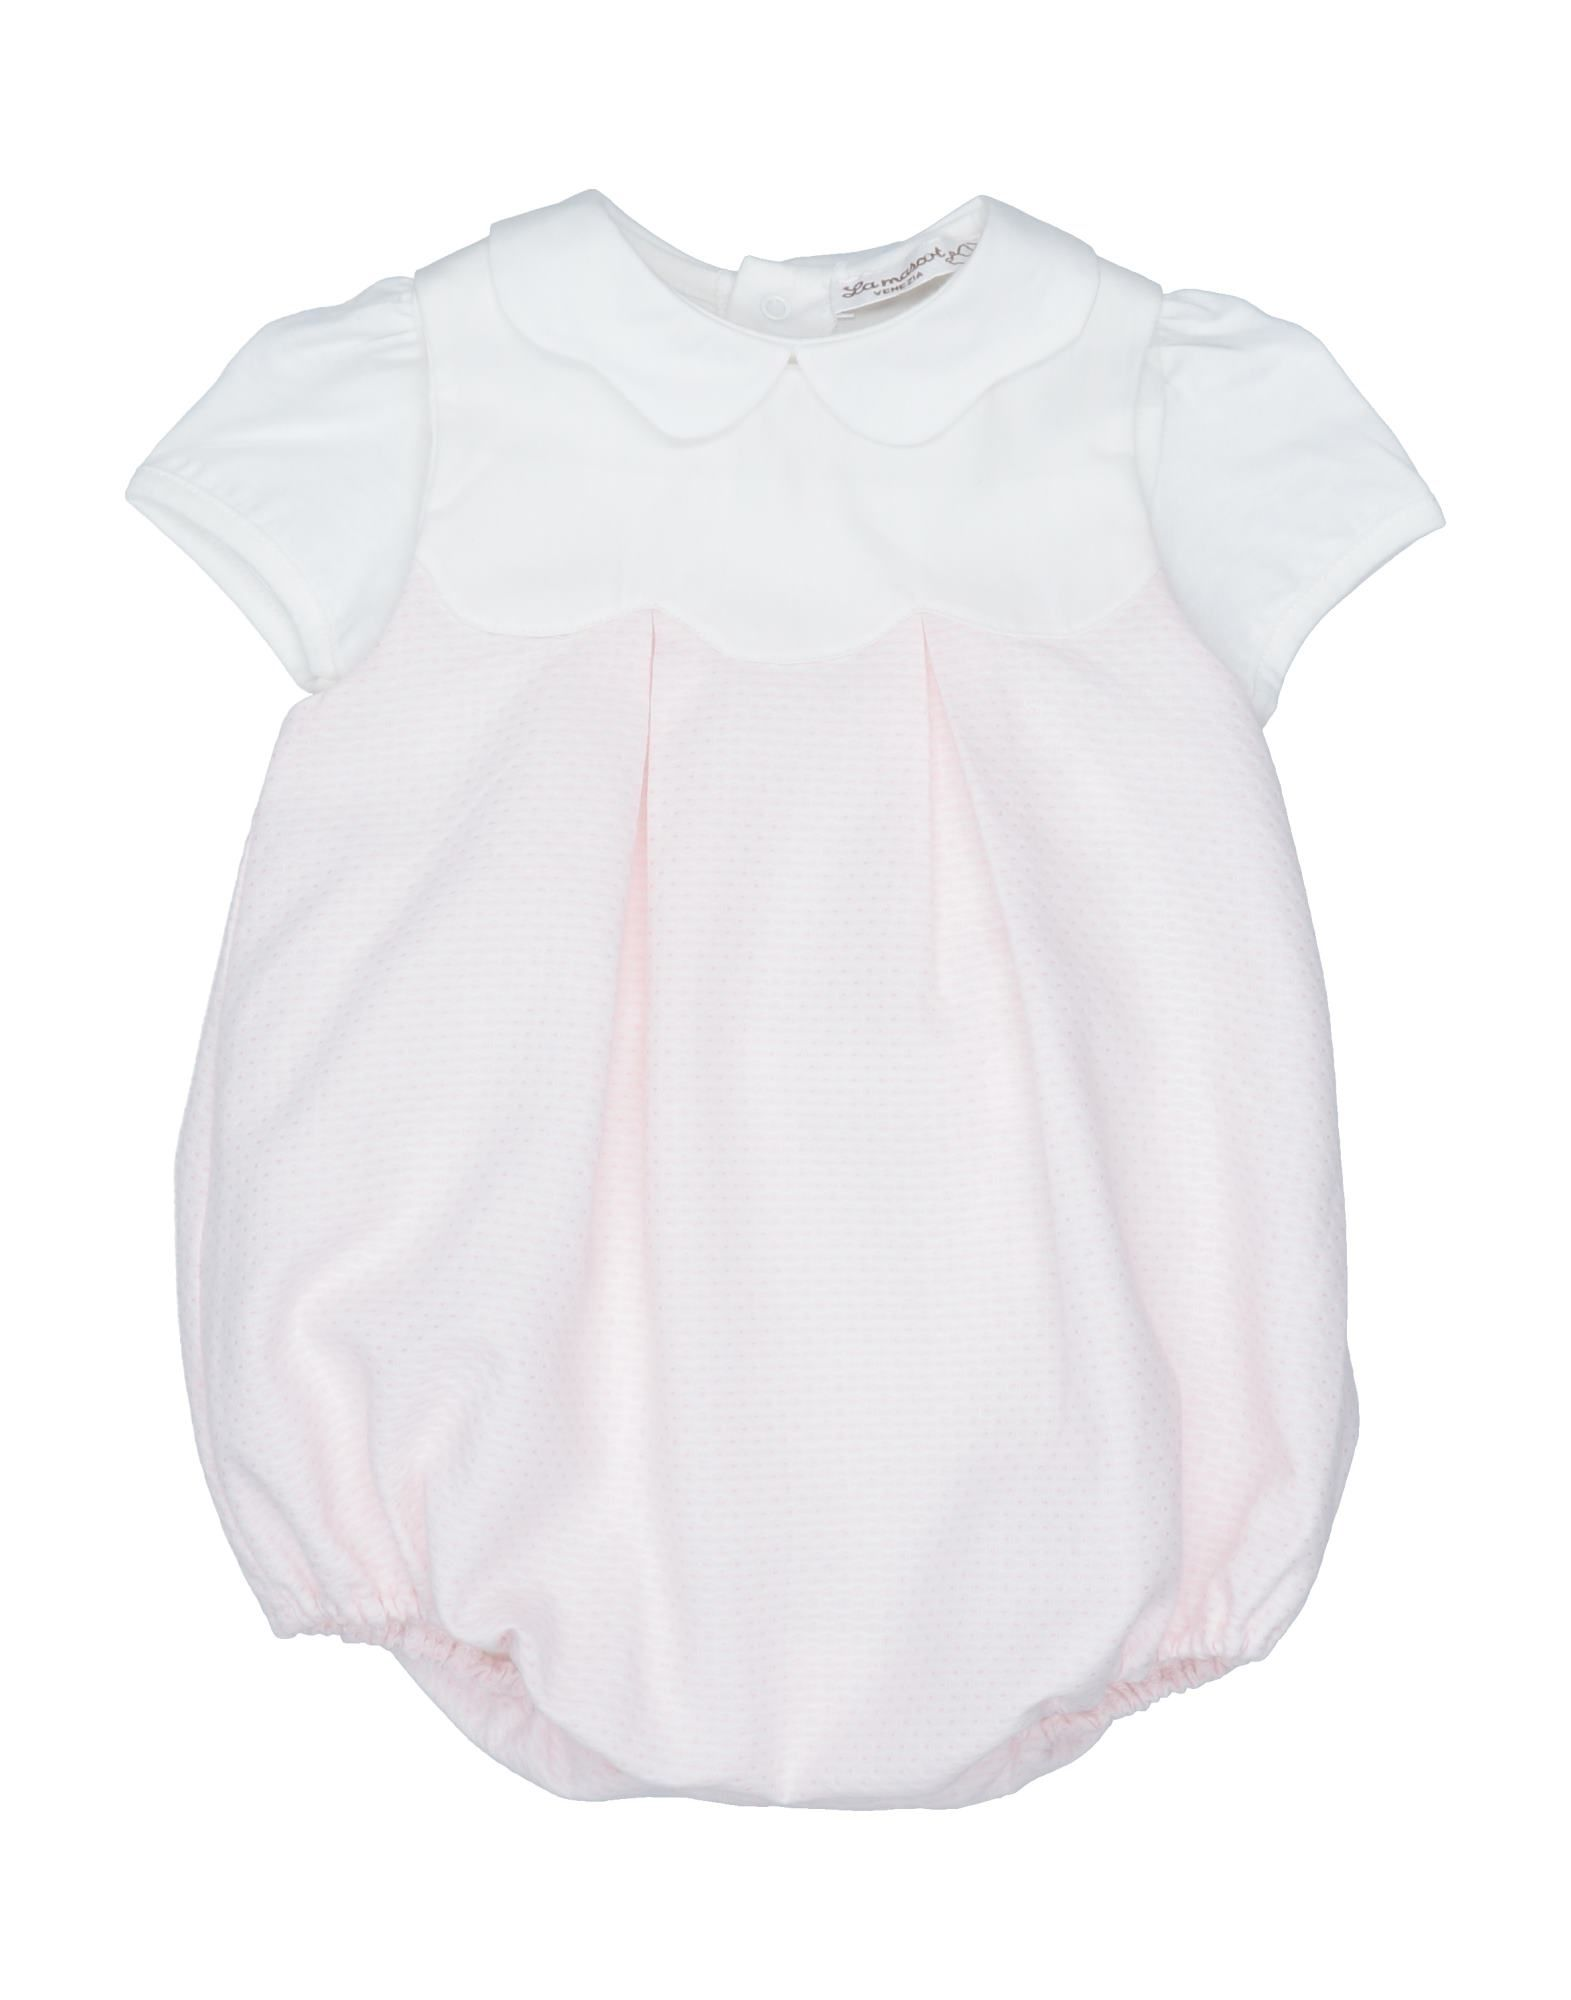 LA MASCOT Bodysuits - Item 15000757